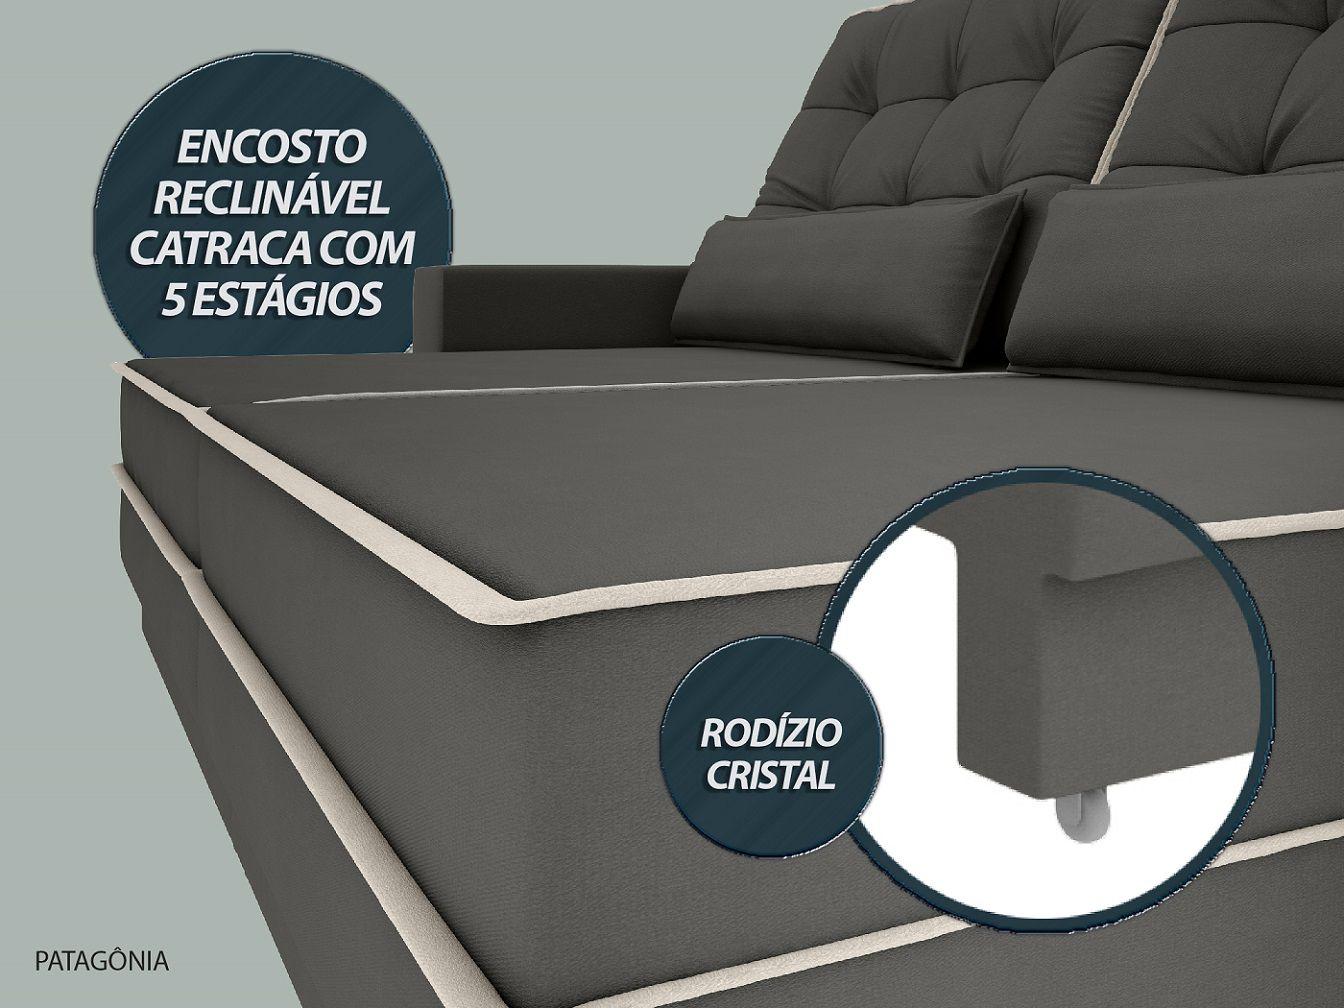 Sofá Patagônia 2,00m Retrátil e Reclinável Velosuede Cinza - NETSOFAS